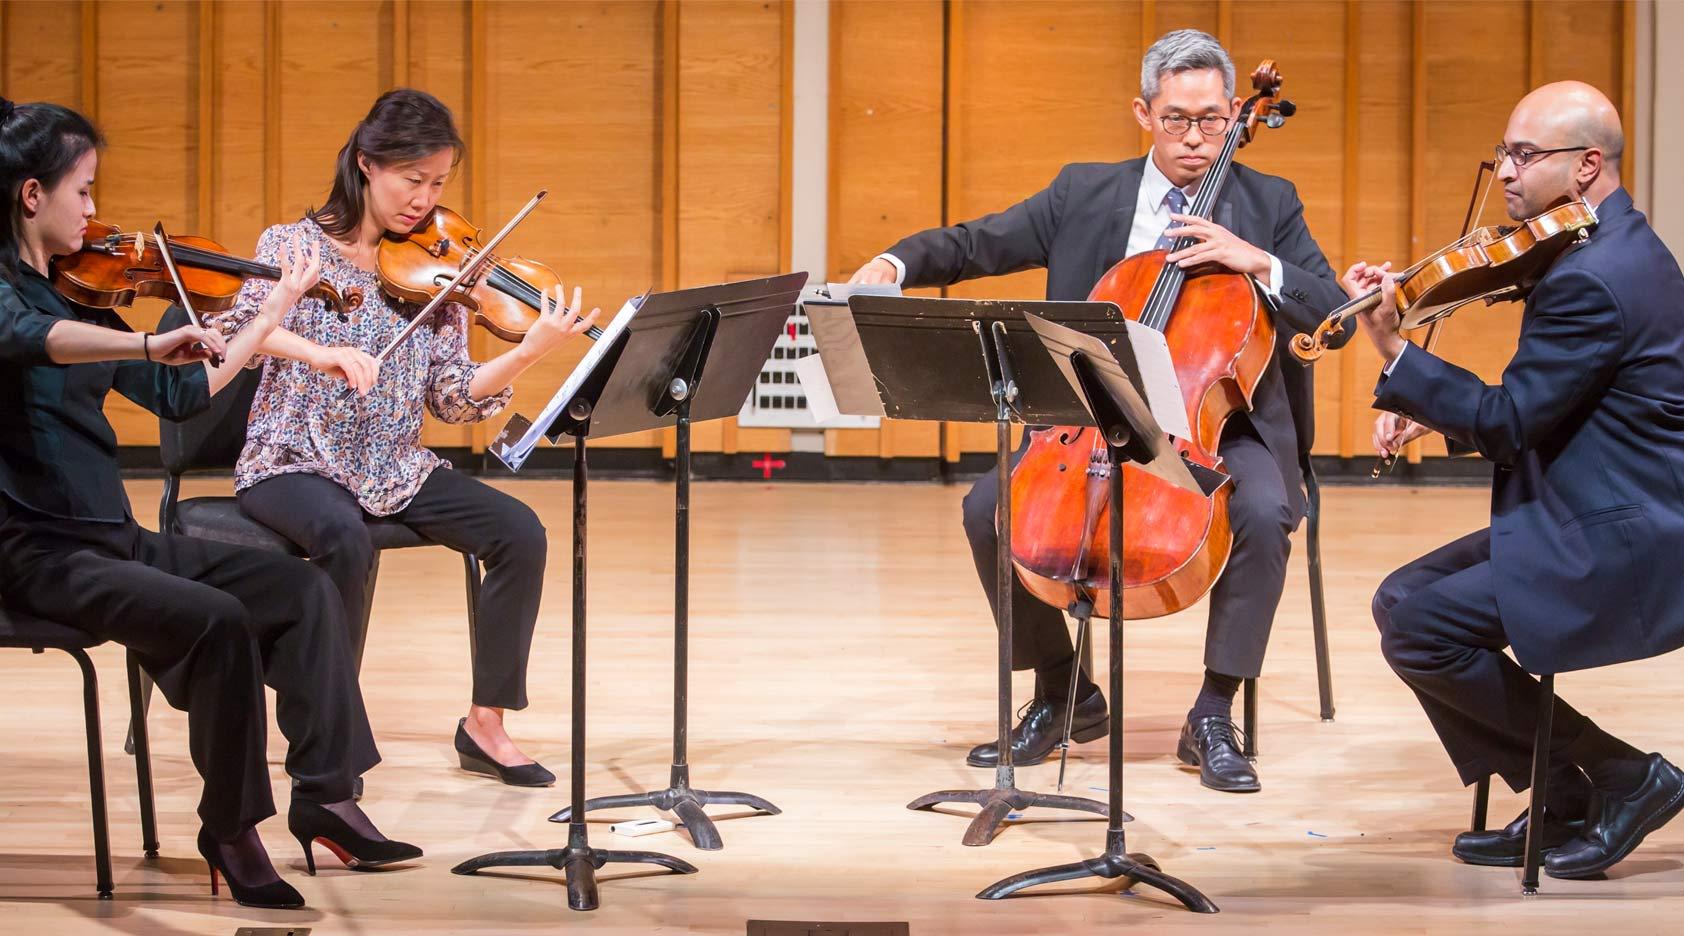 CANCELLED: Philharmonic Ensembles at Merkin Hall